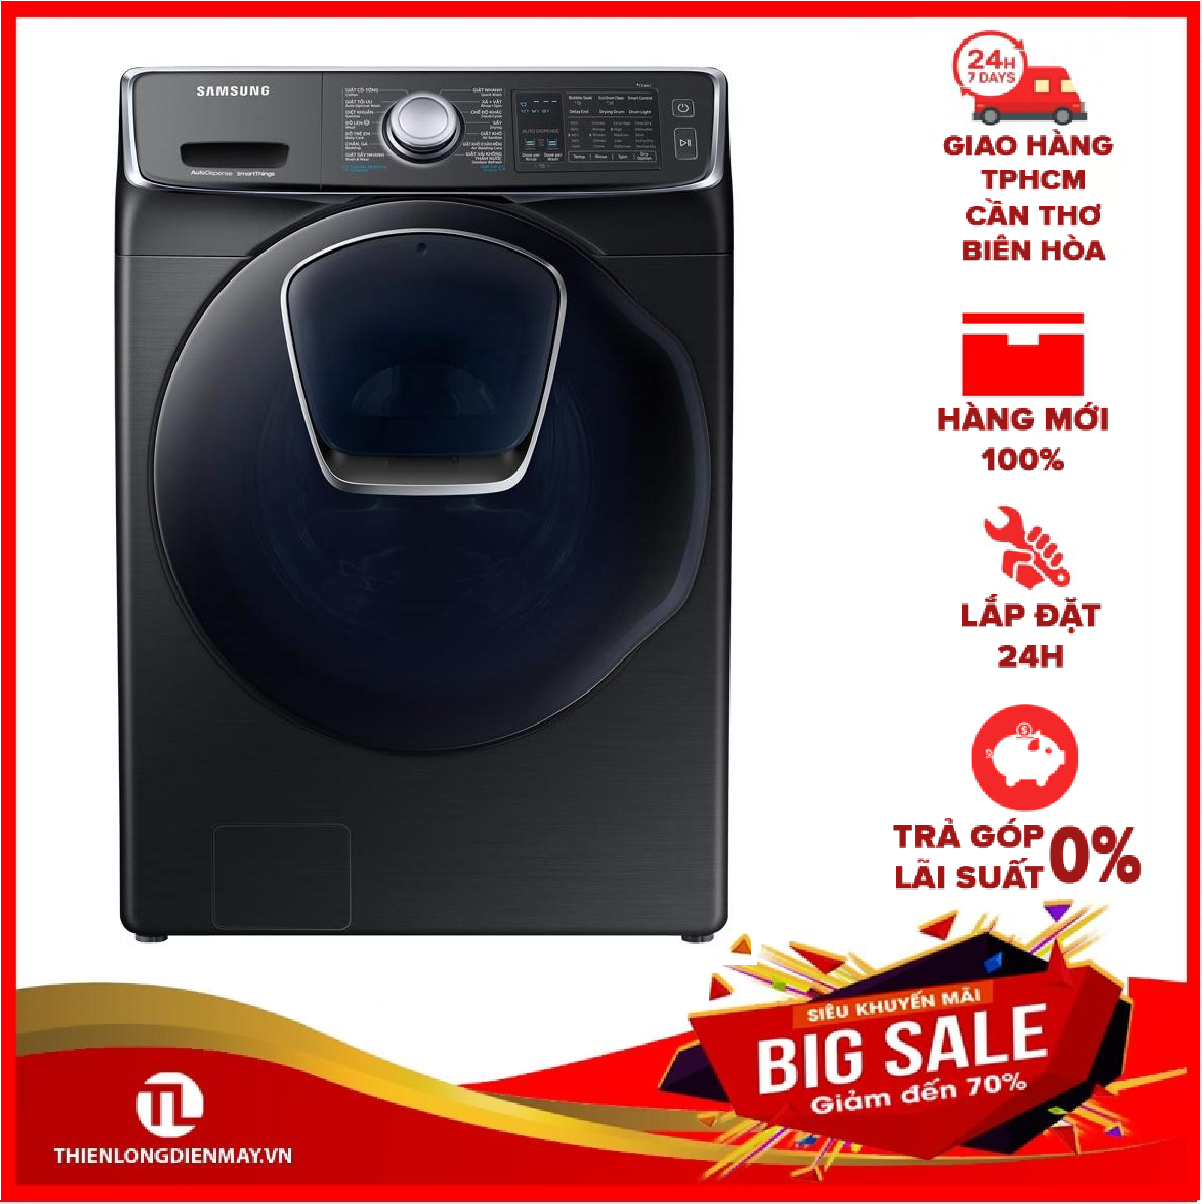 [THU THẬP VOUCHER 1.000K TỪ LZD] Máy giặt sấy Samsung Add Wash Inverter 19 kg WD19N8750KV/SV